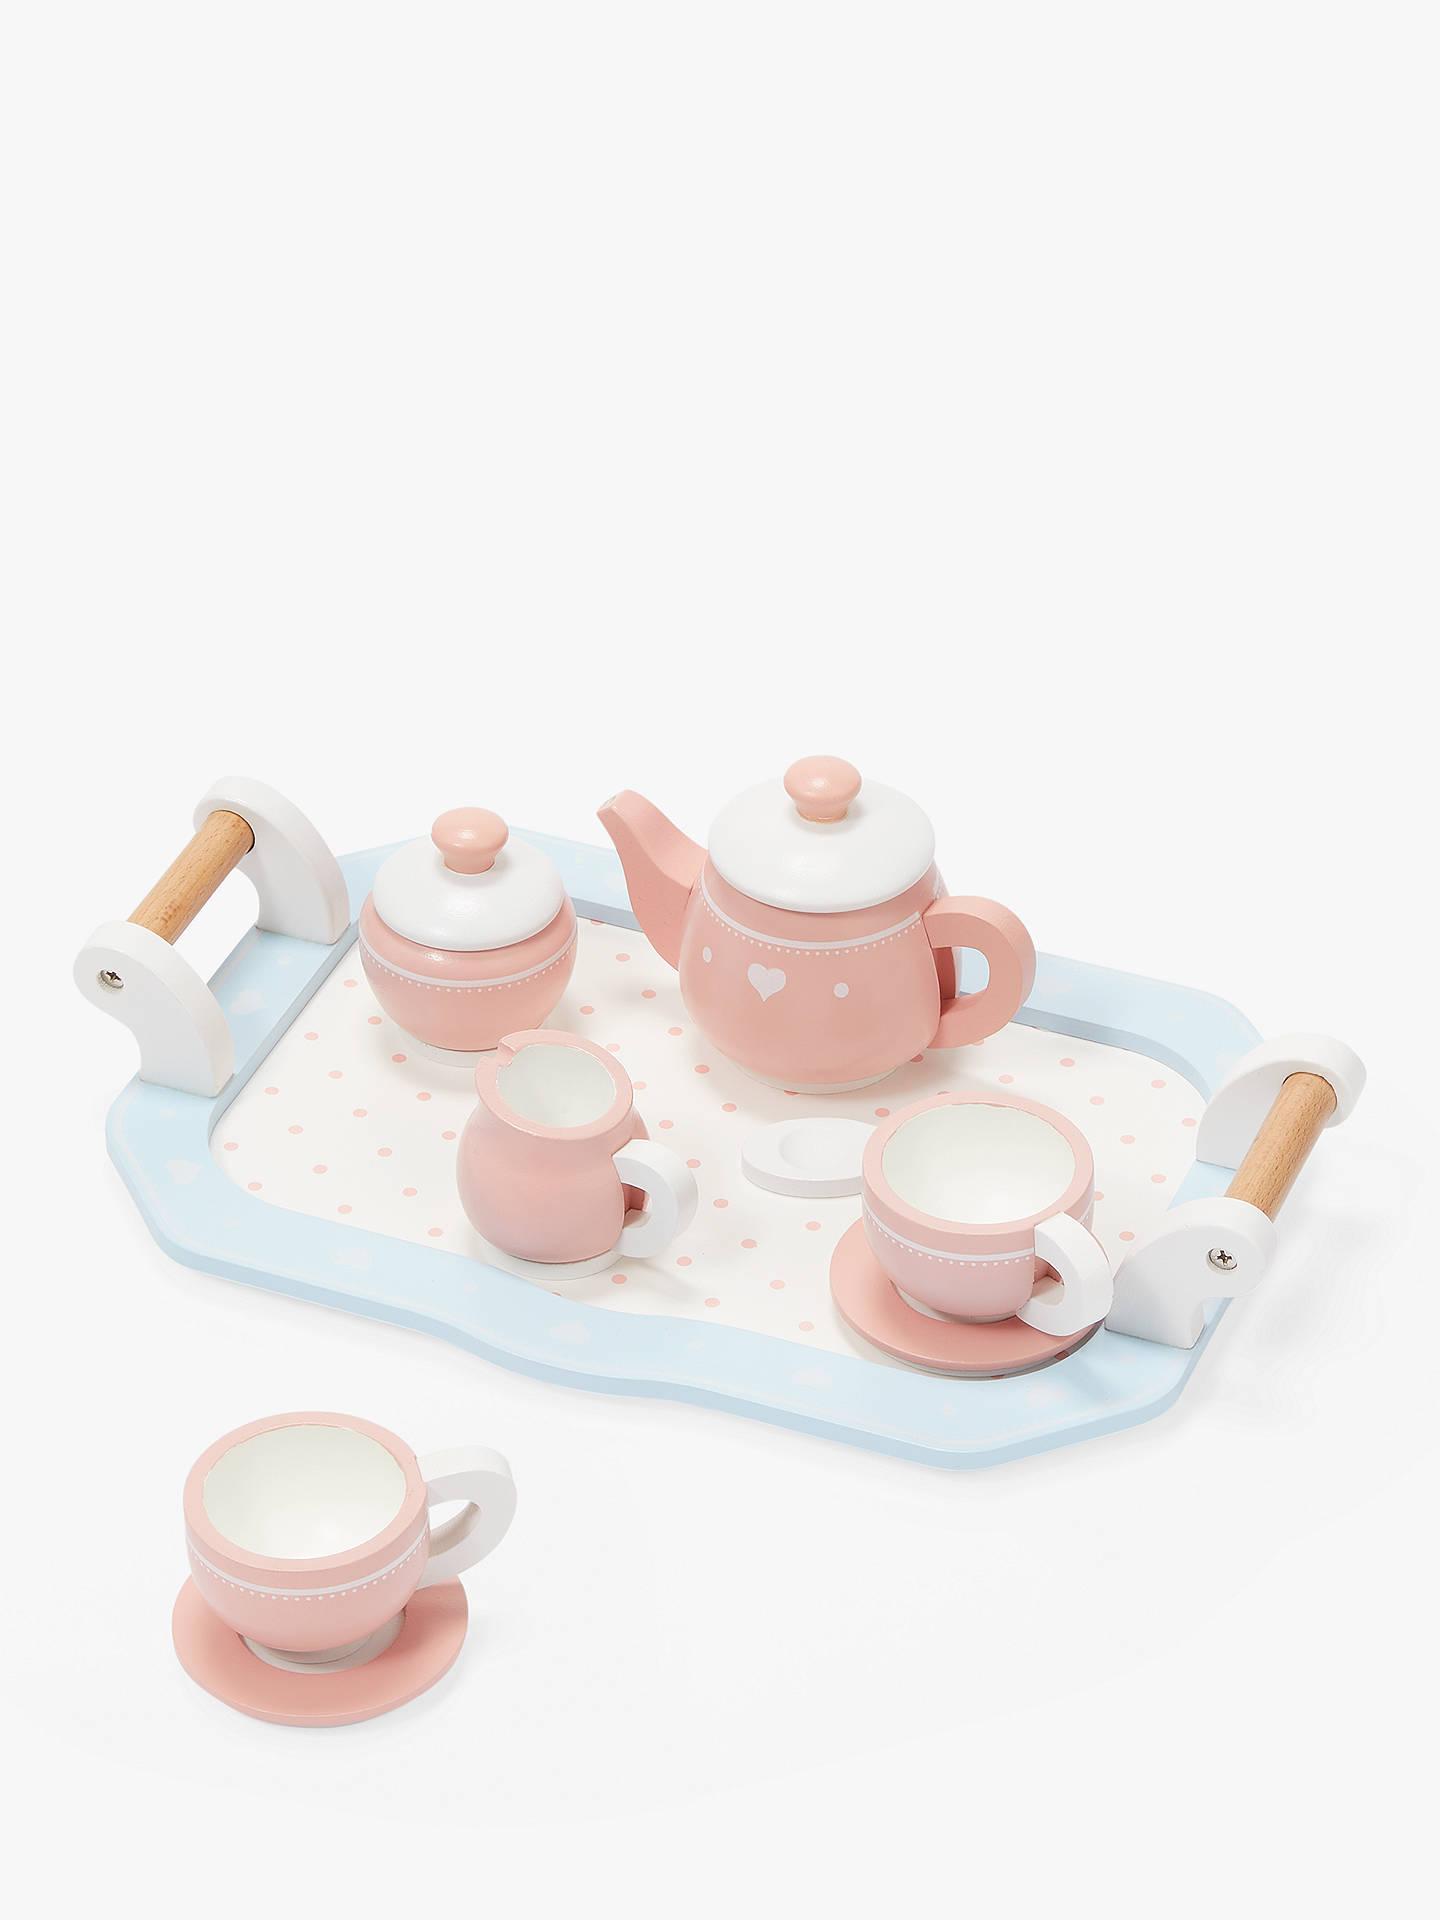 John Lewis & Partners Wooden Toy Tea Set by John Lewis & Partners